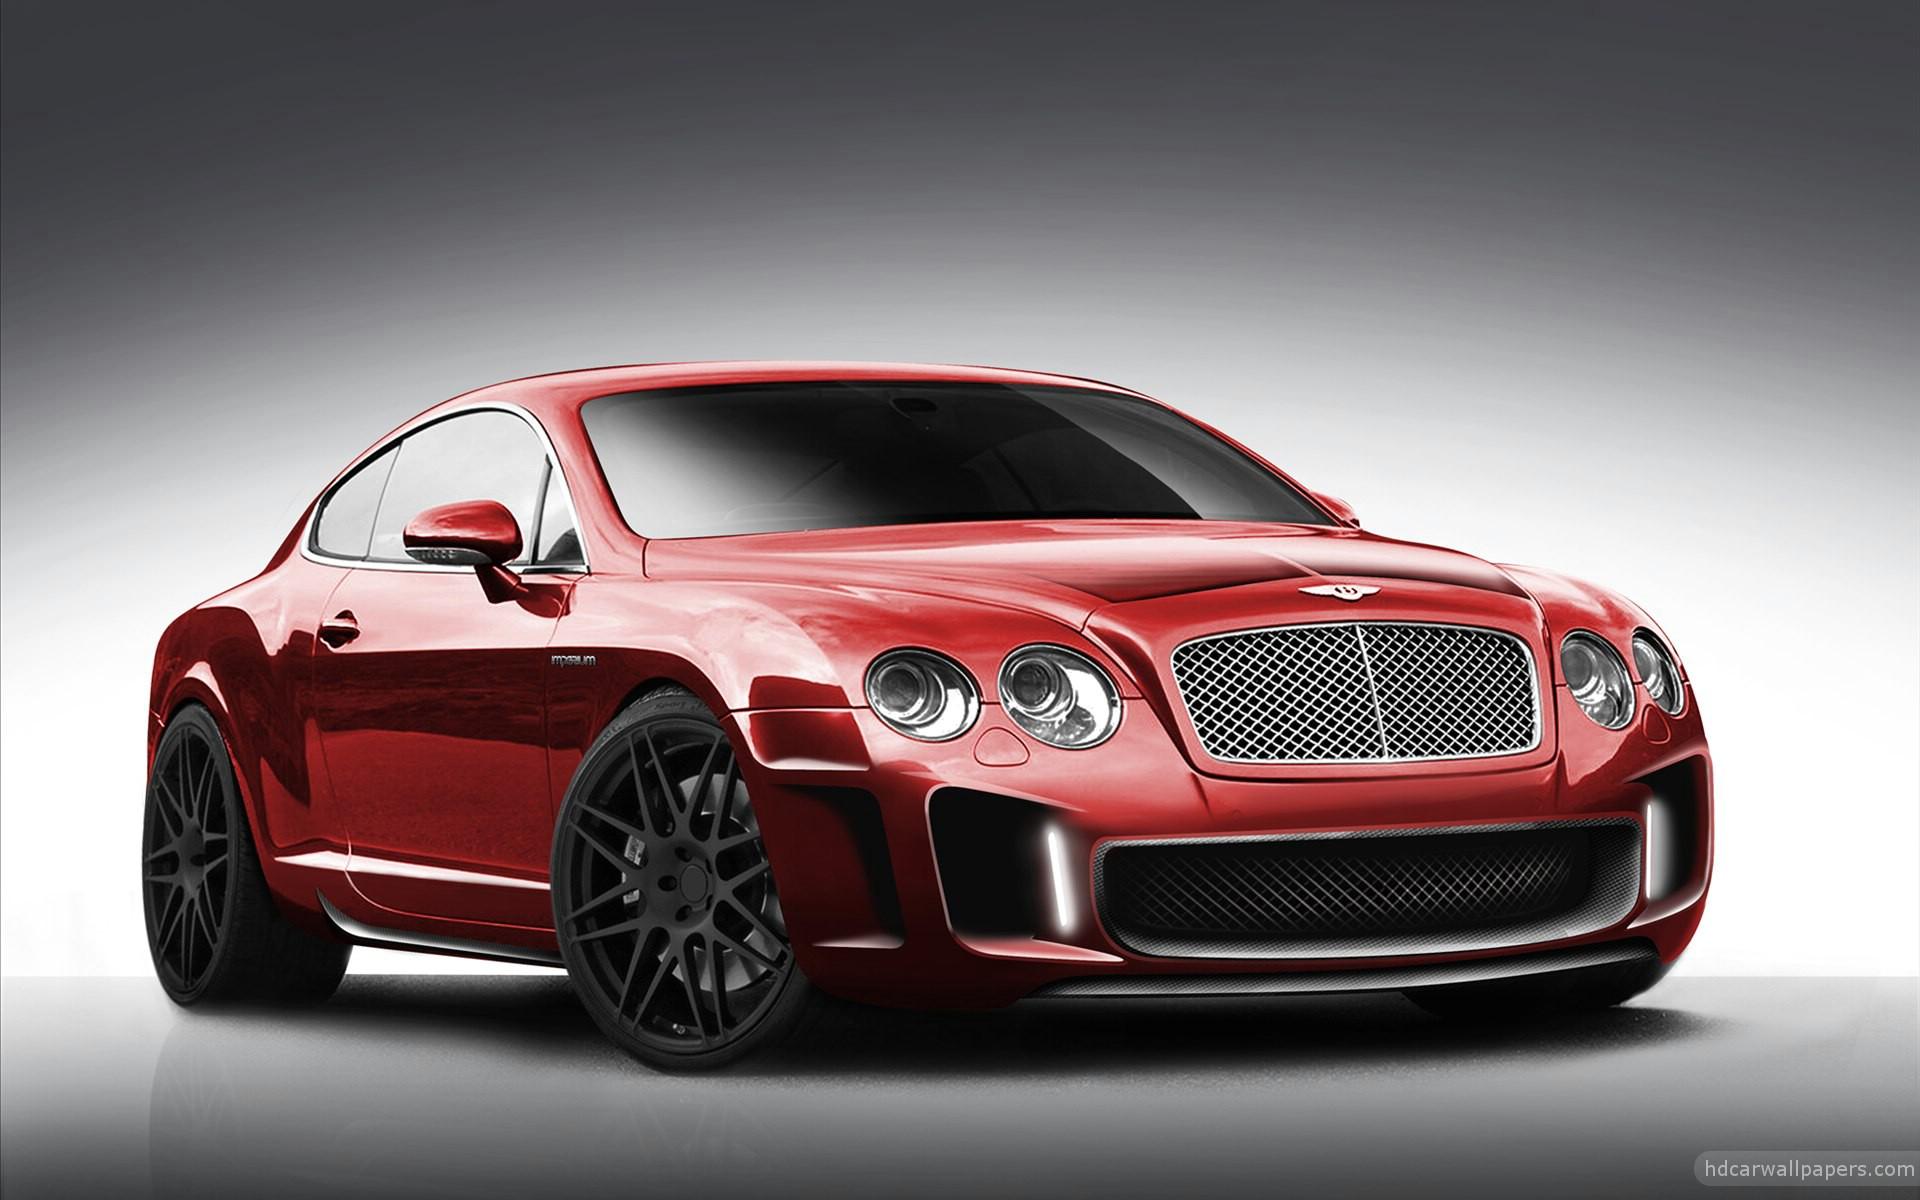 2011 Bentley Continental GT Imperium Wallpaper